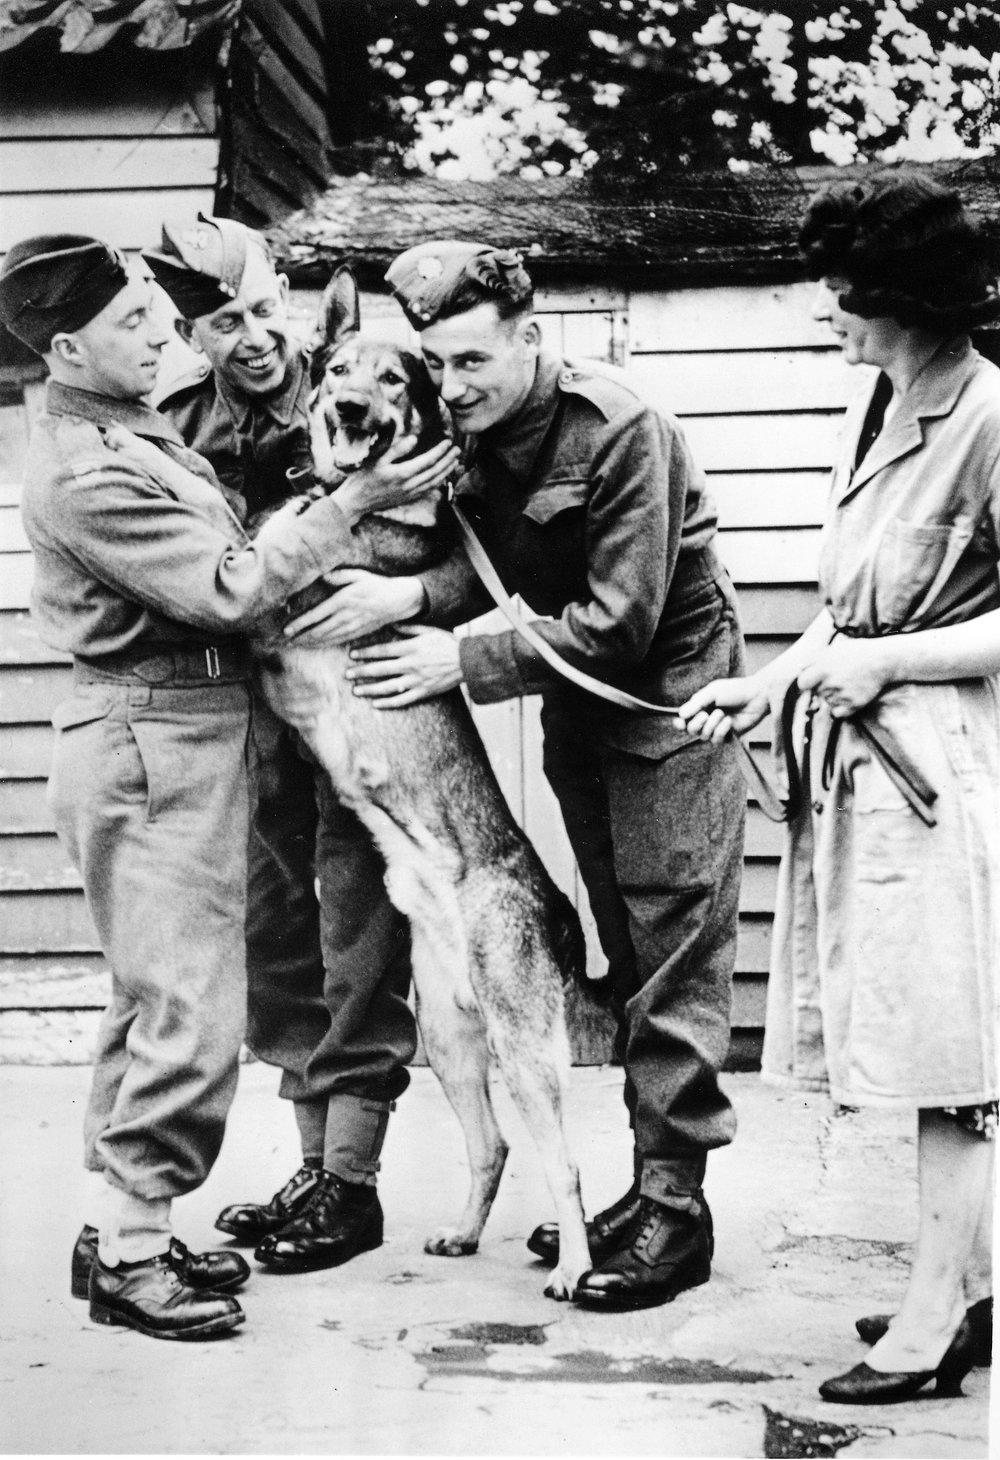 Soldiers-greet-dog.jpg